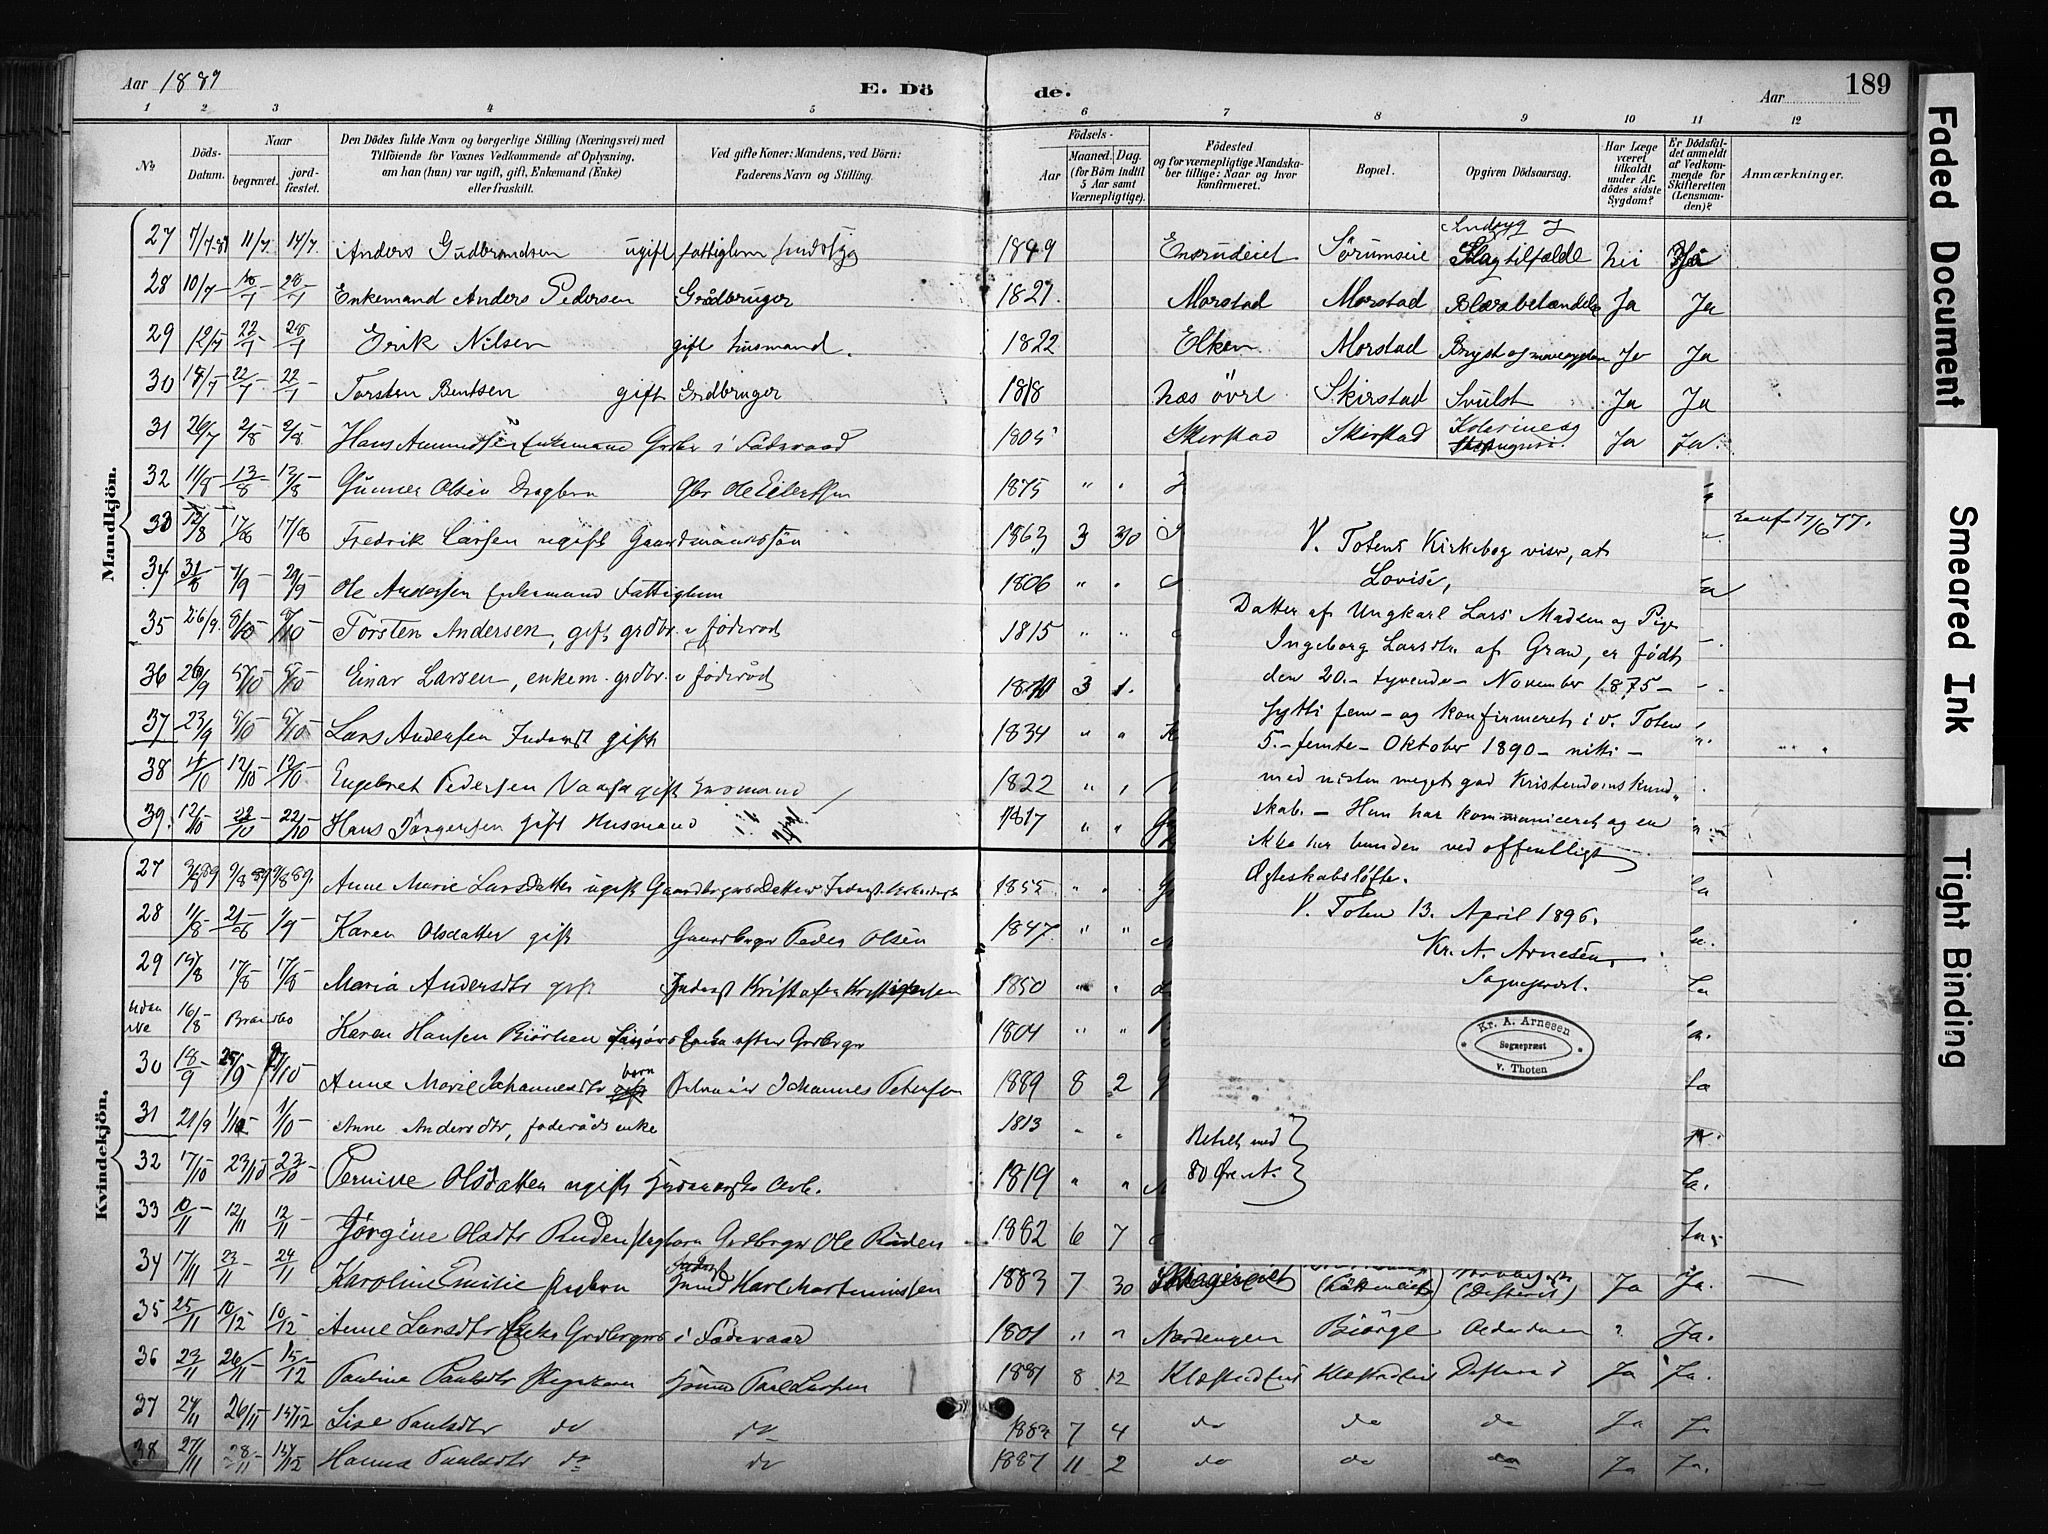 SAH, Gran prestekontor, Ministerialbok nr. 17, 1889-1897, s. 189